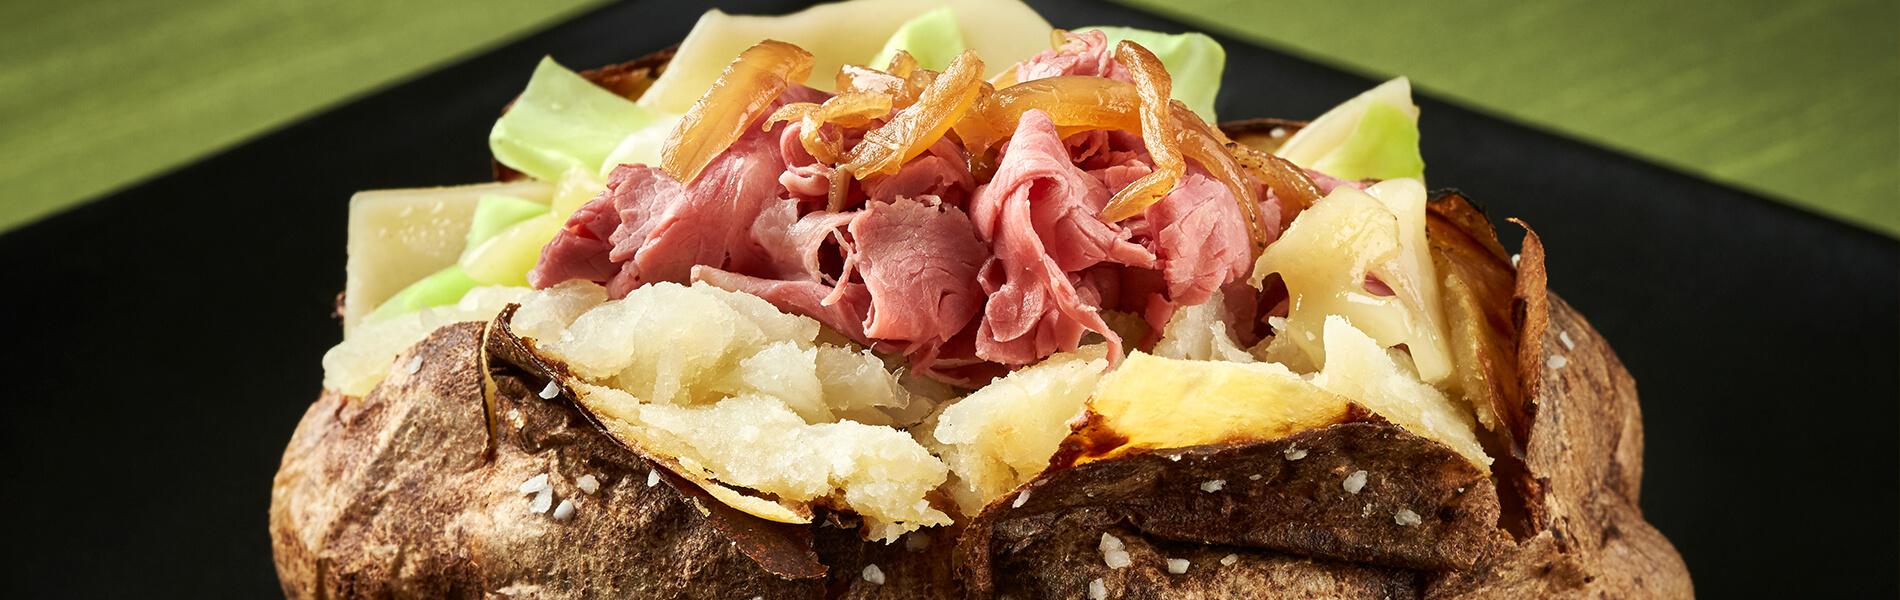 Enjoy Irish specialties, loaded baked potatoes and more